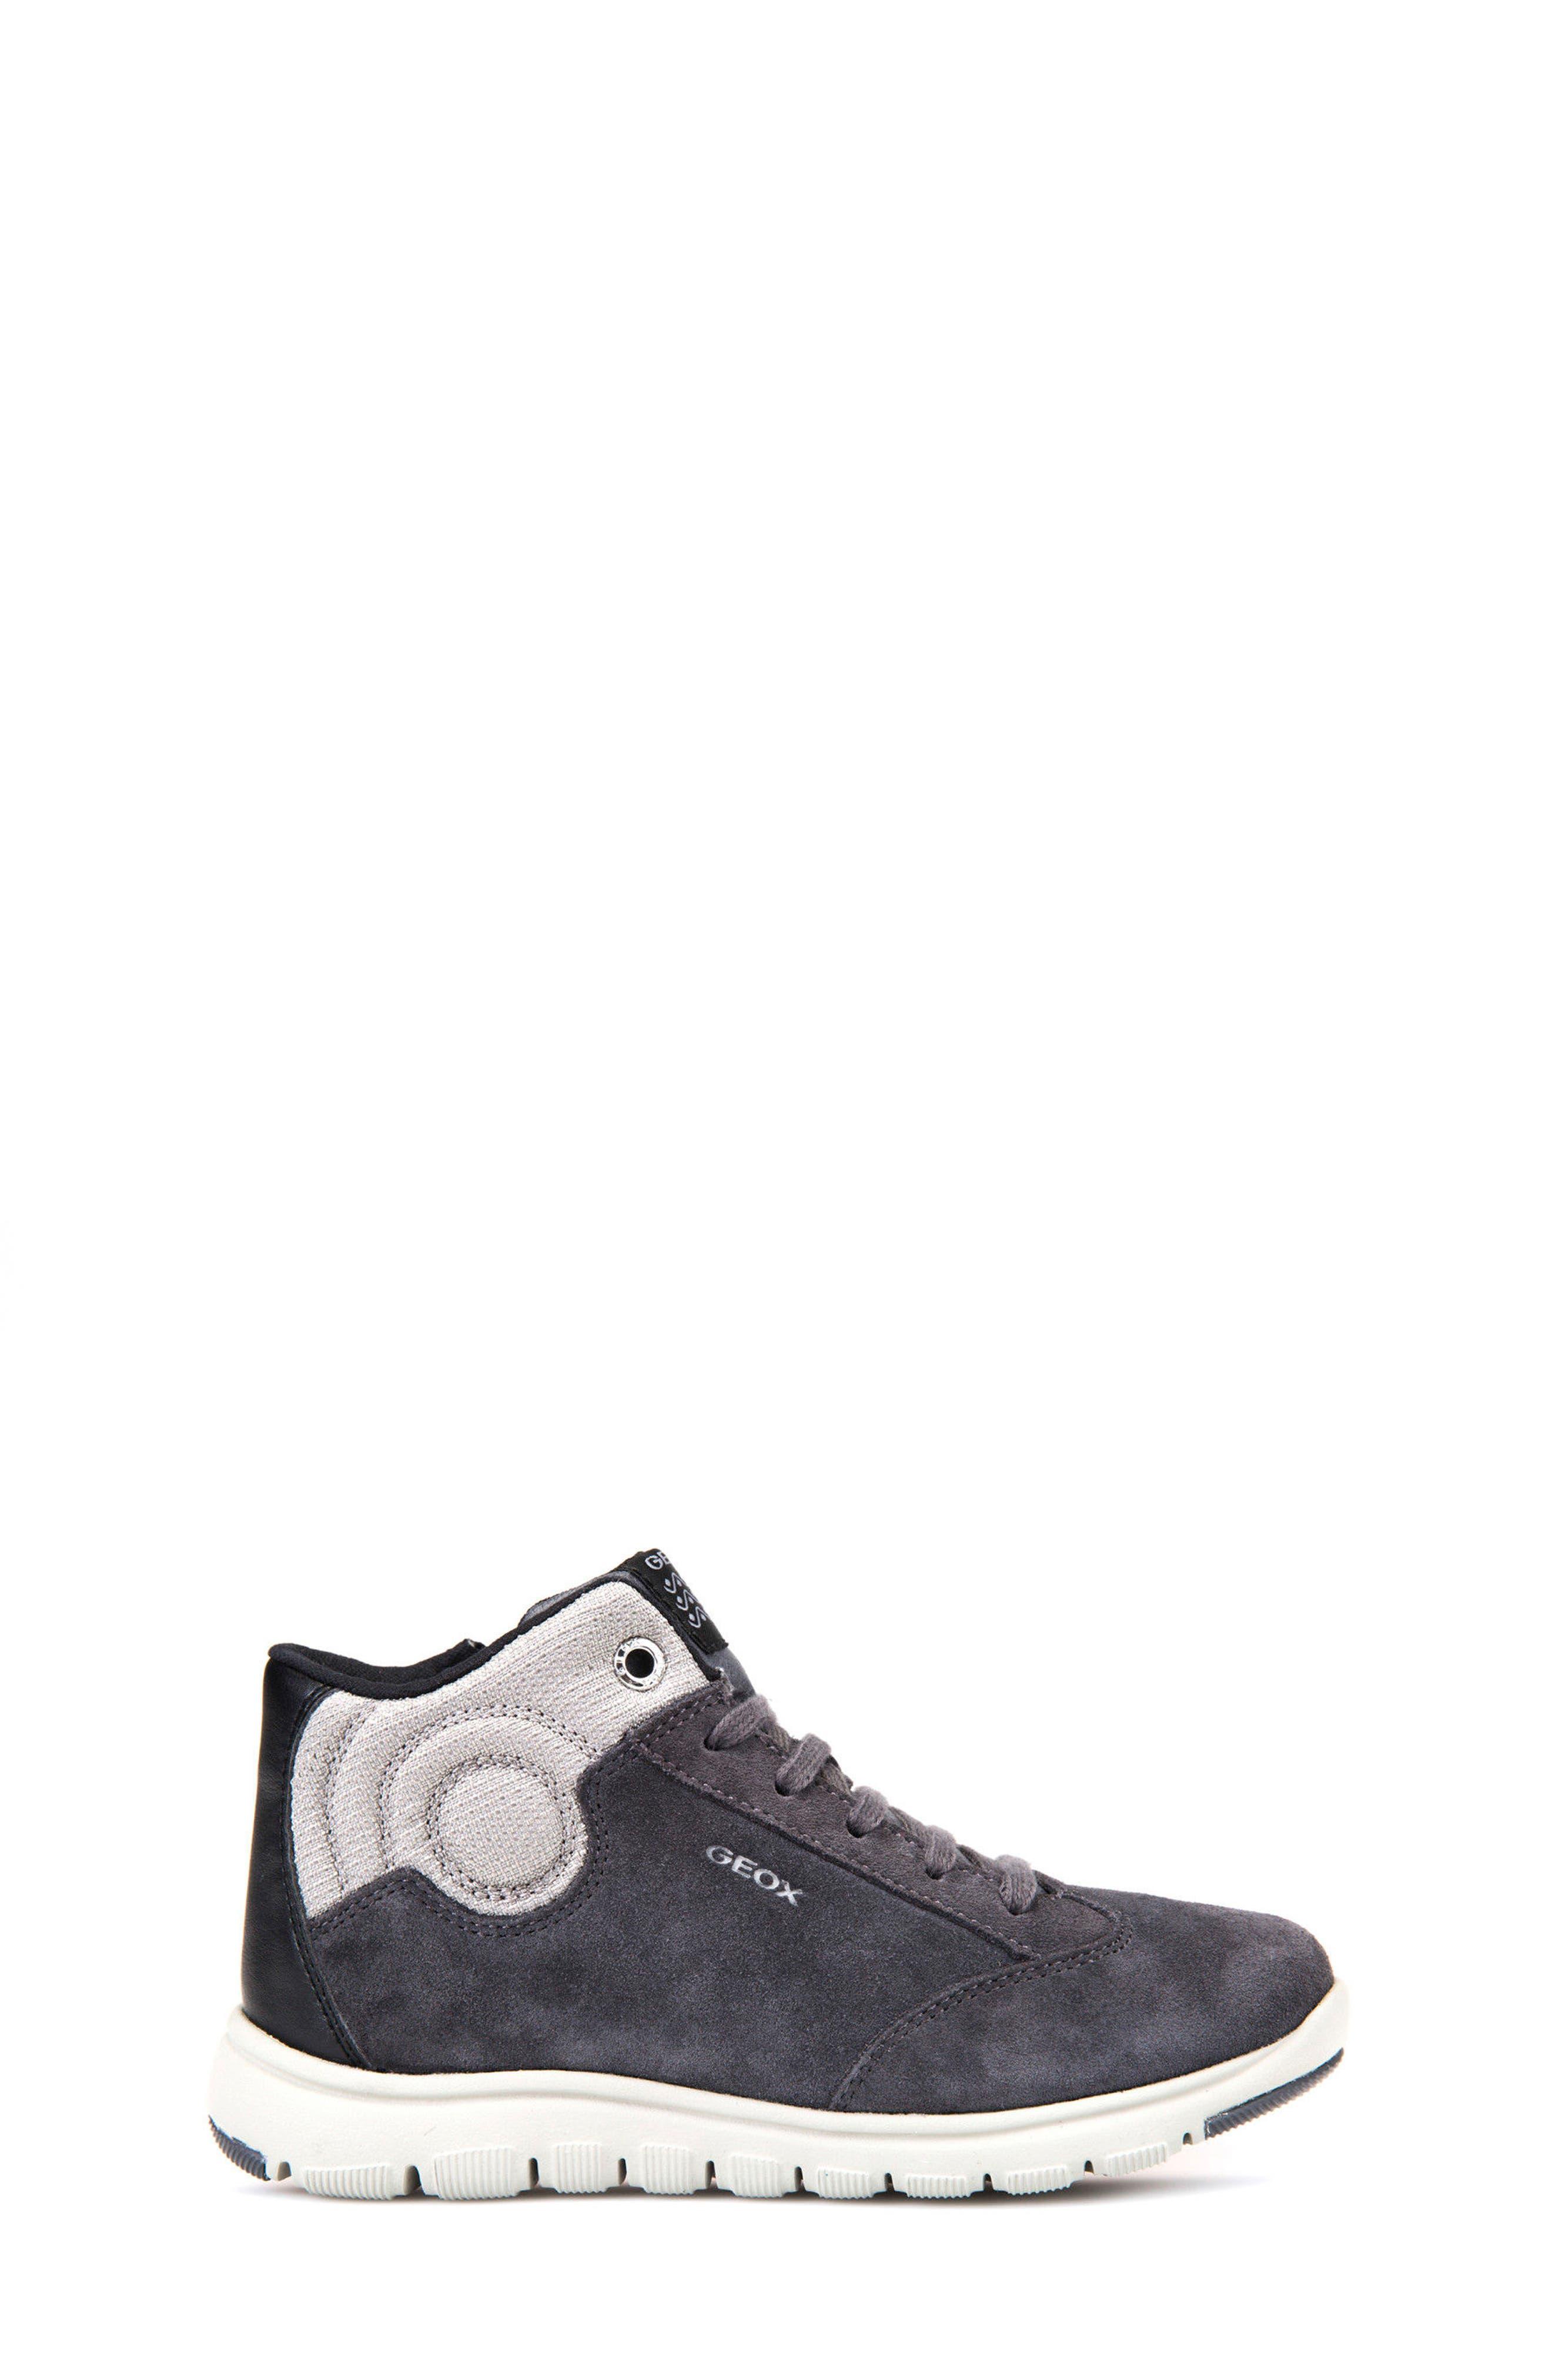 Xunday Mid Top Sneaker,                             Alternate thumbnail 3, color,                             Grey/ Light Grey